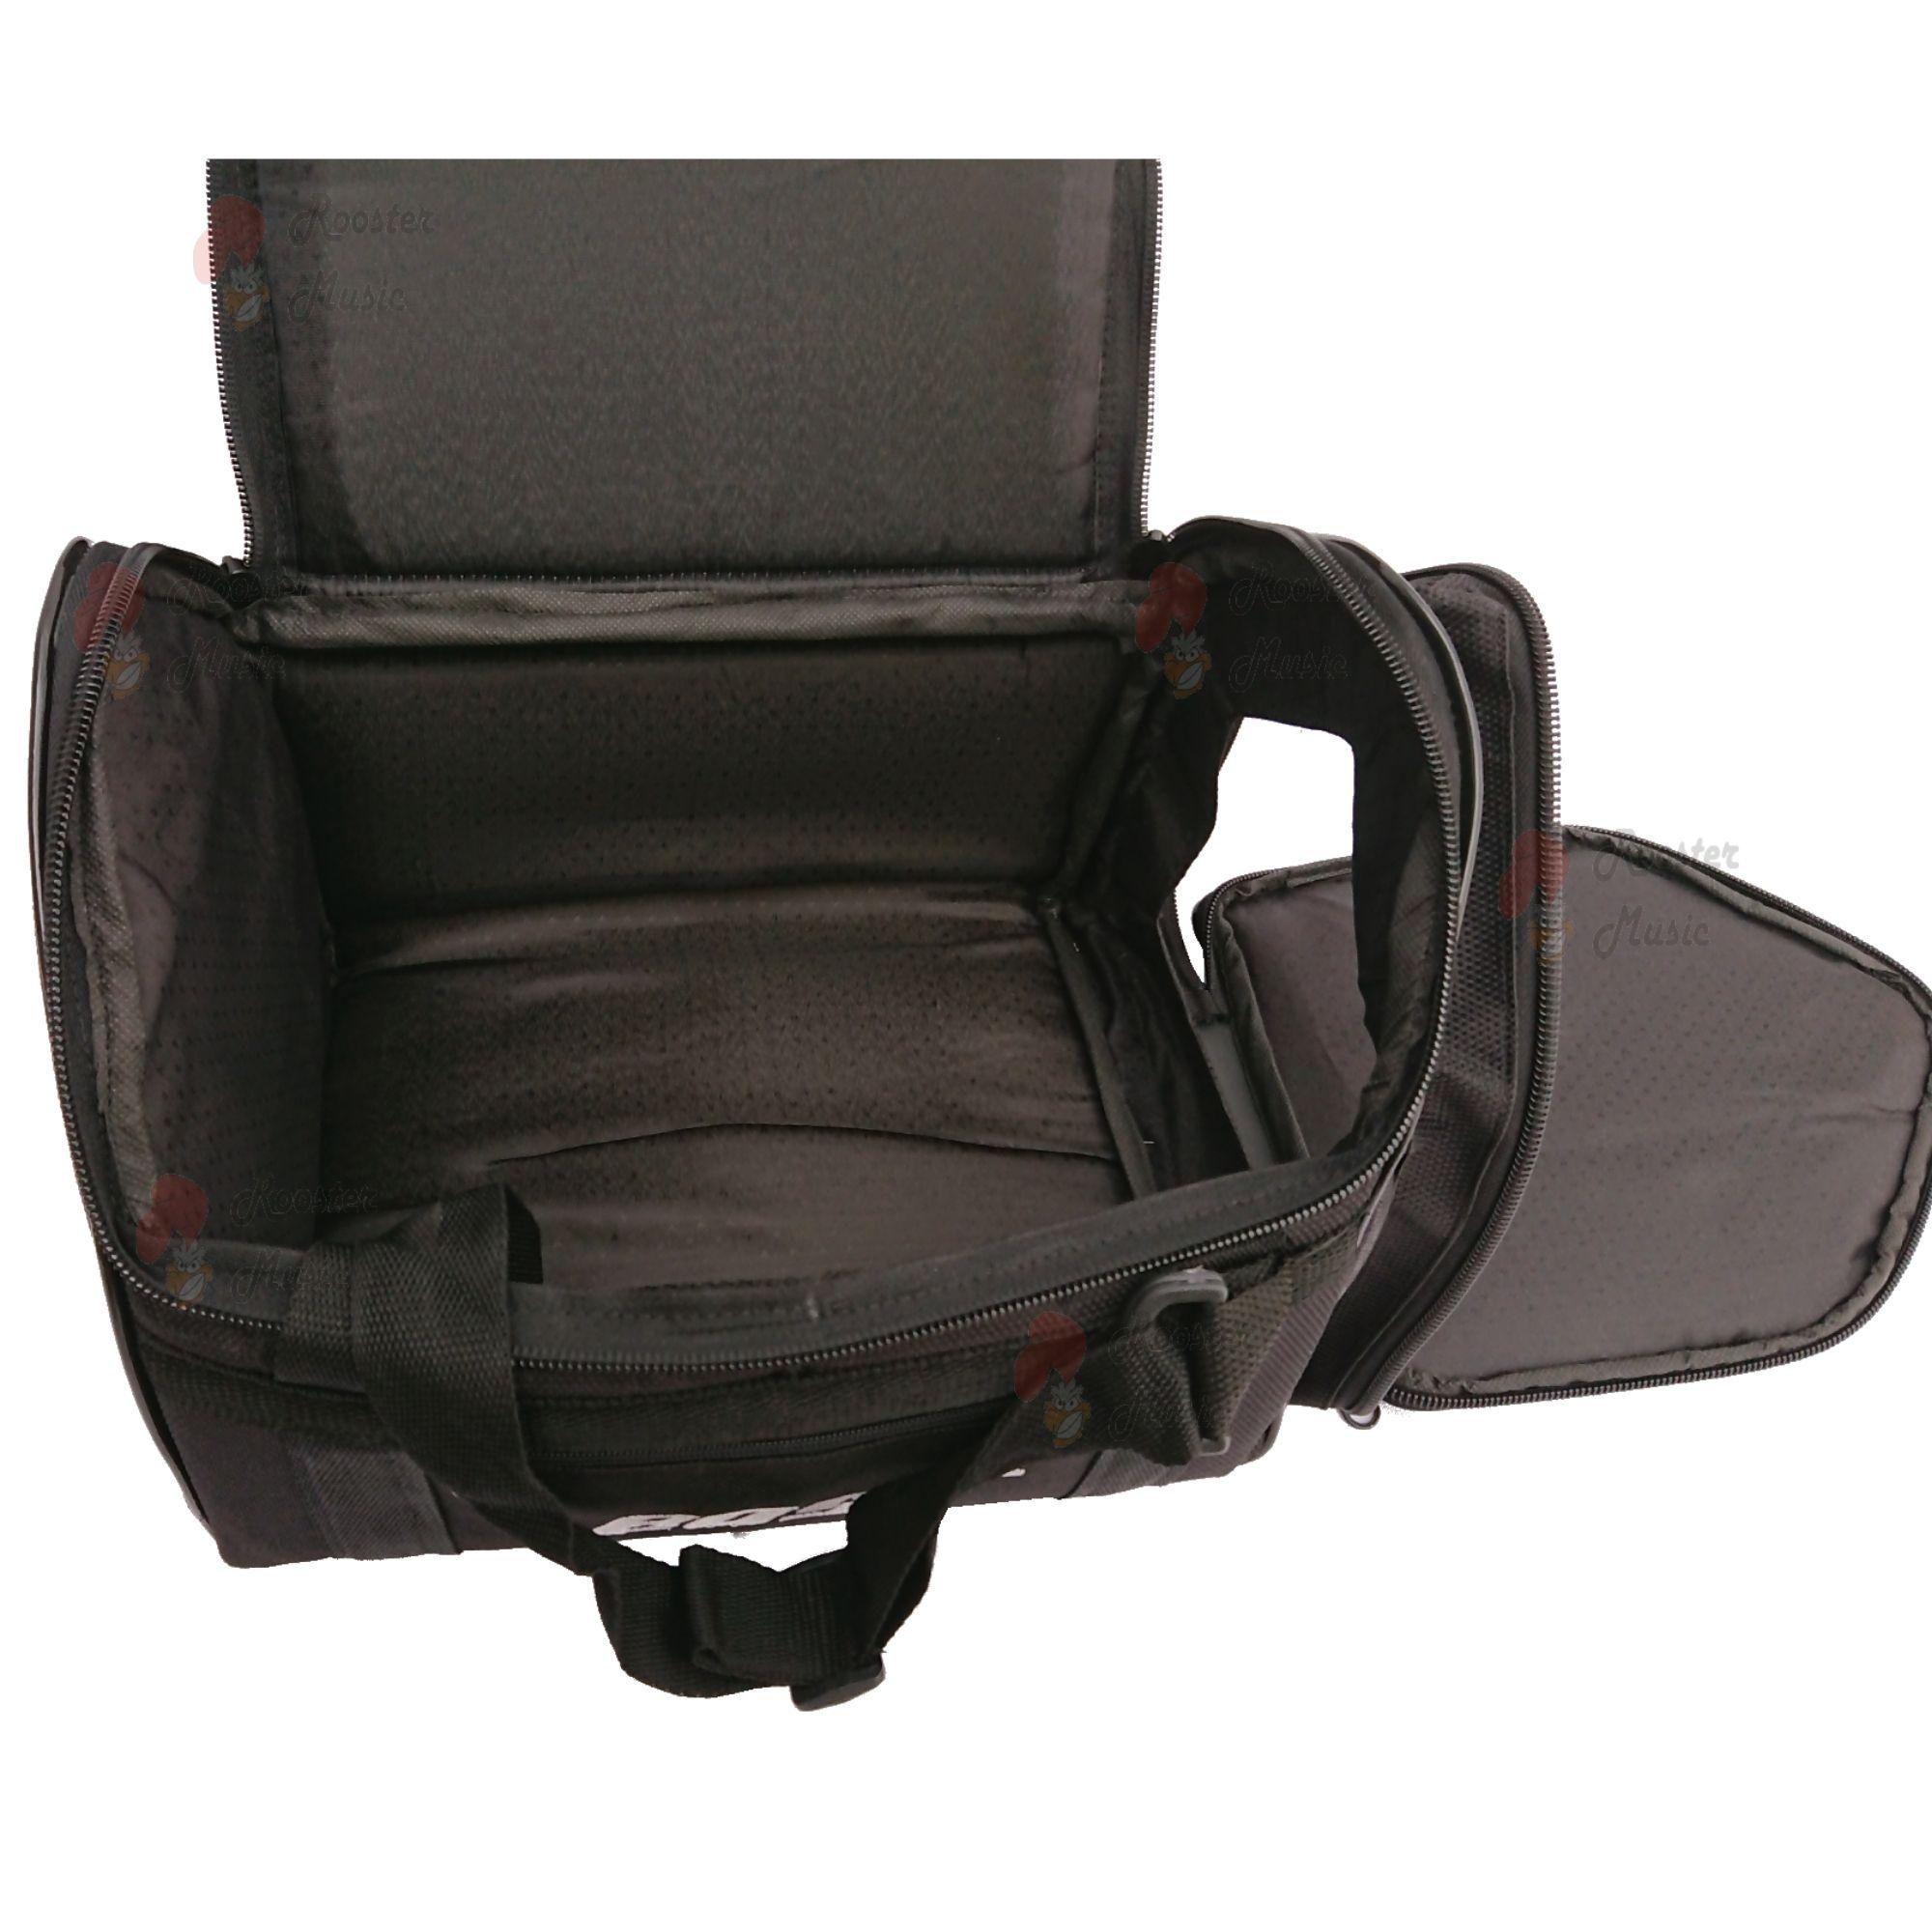 Capa Bag para Caixa de Som Bose S1 Pro. Modelo Semi Case Premium (34x25x27).